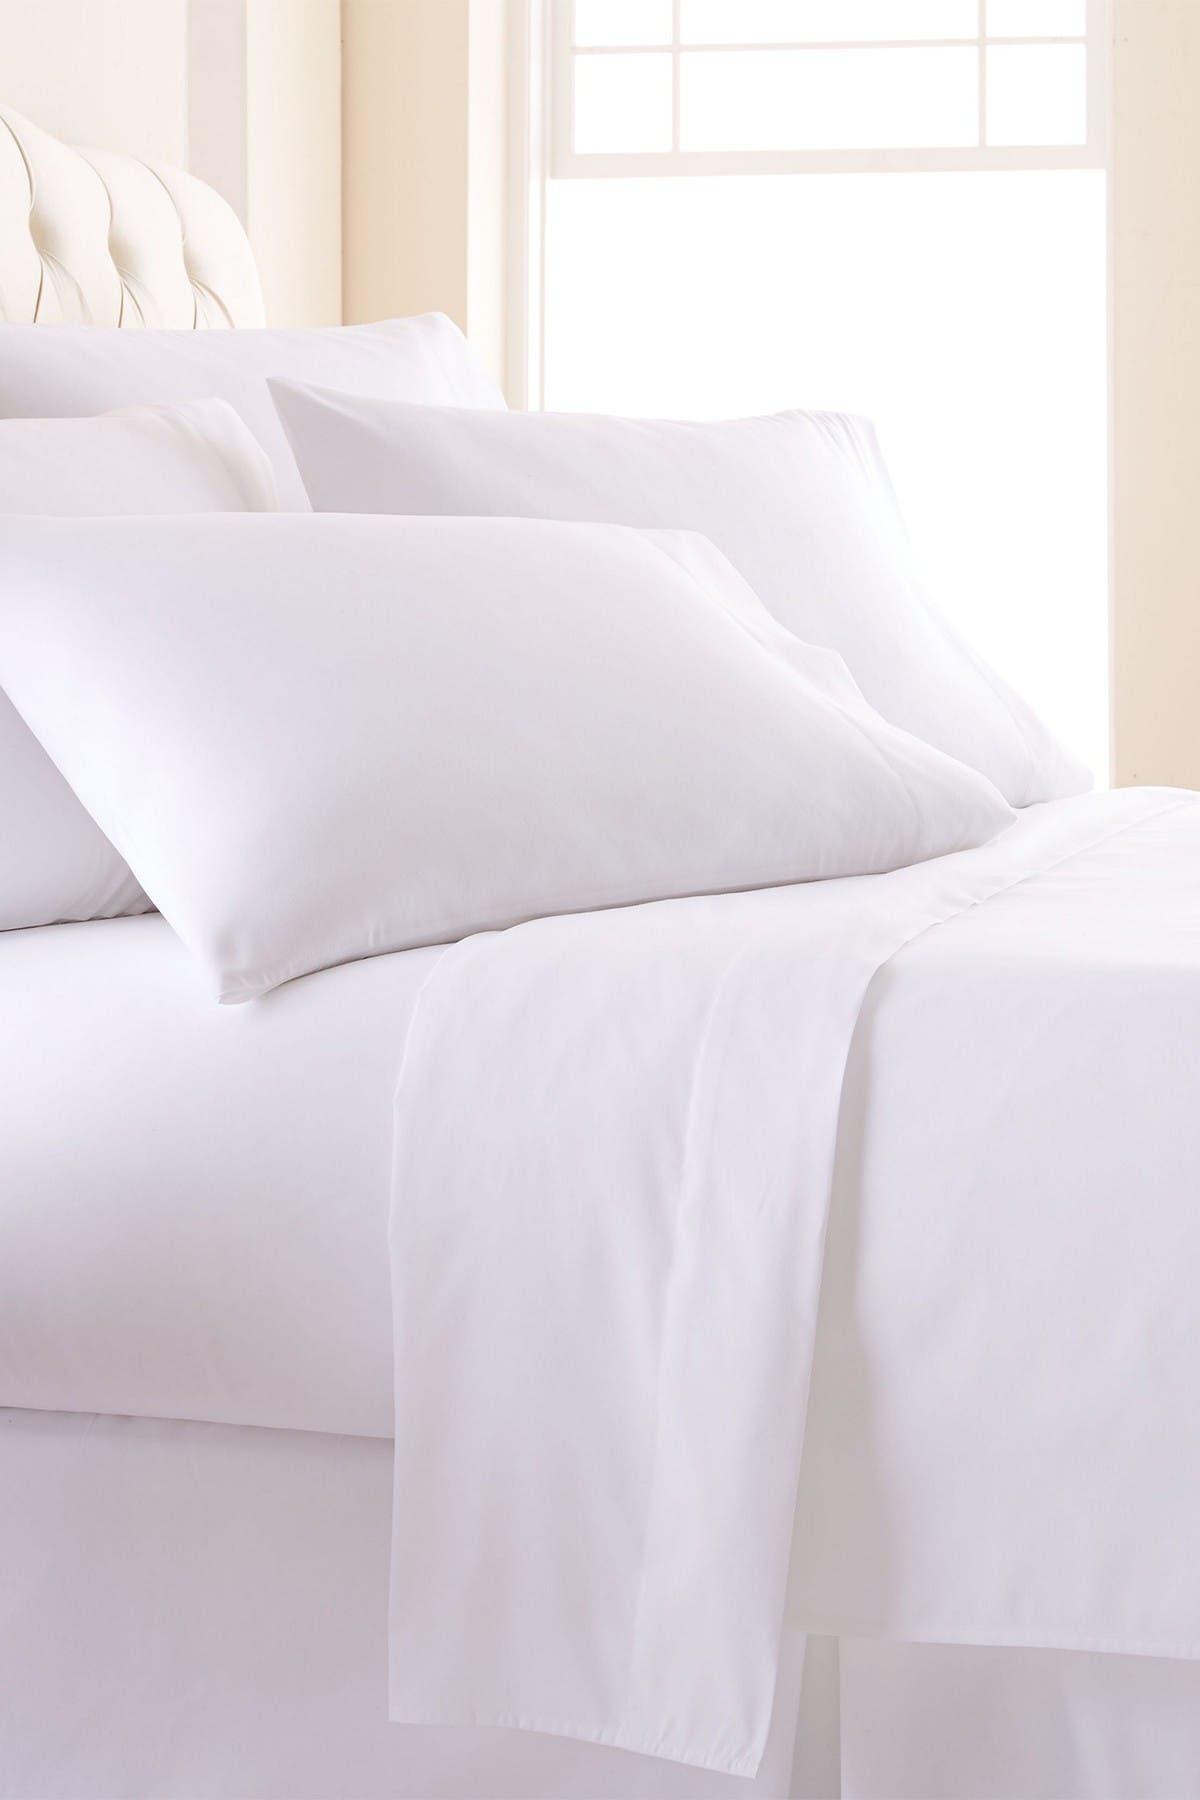 Image of SOUTHSHORE FINE LINENS King Sized Vilano Springs Extra Deep Pocket Sheet Set - Bright White